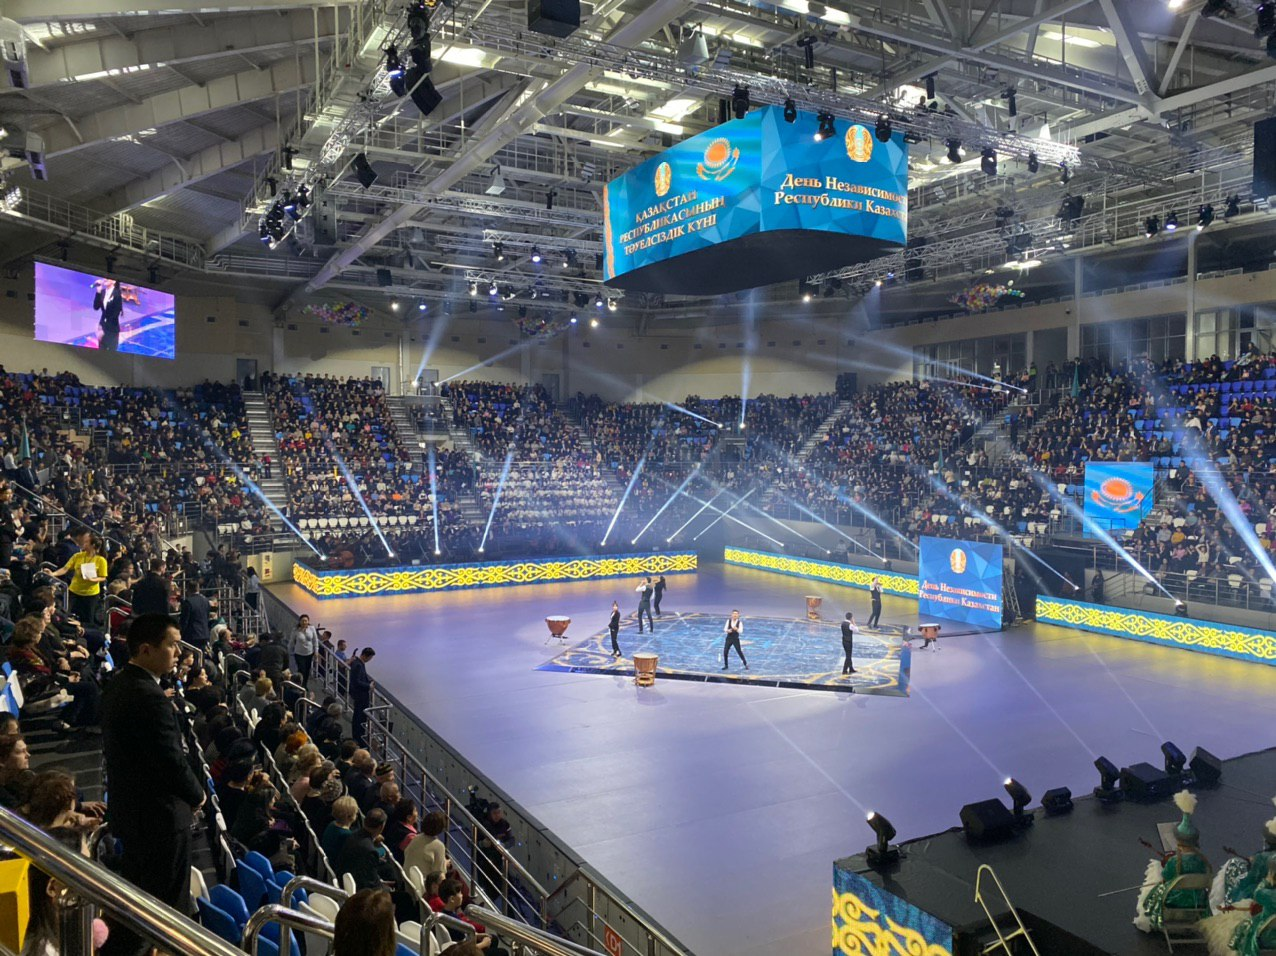 Abai Arena sports complex Semipalatinsk, Kazakhstan